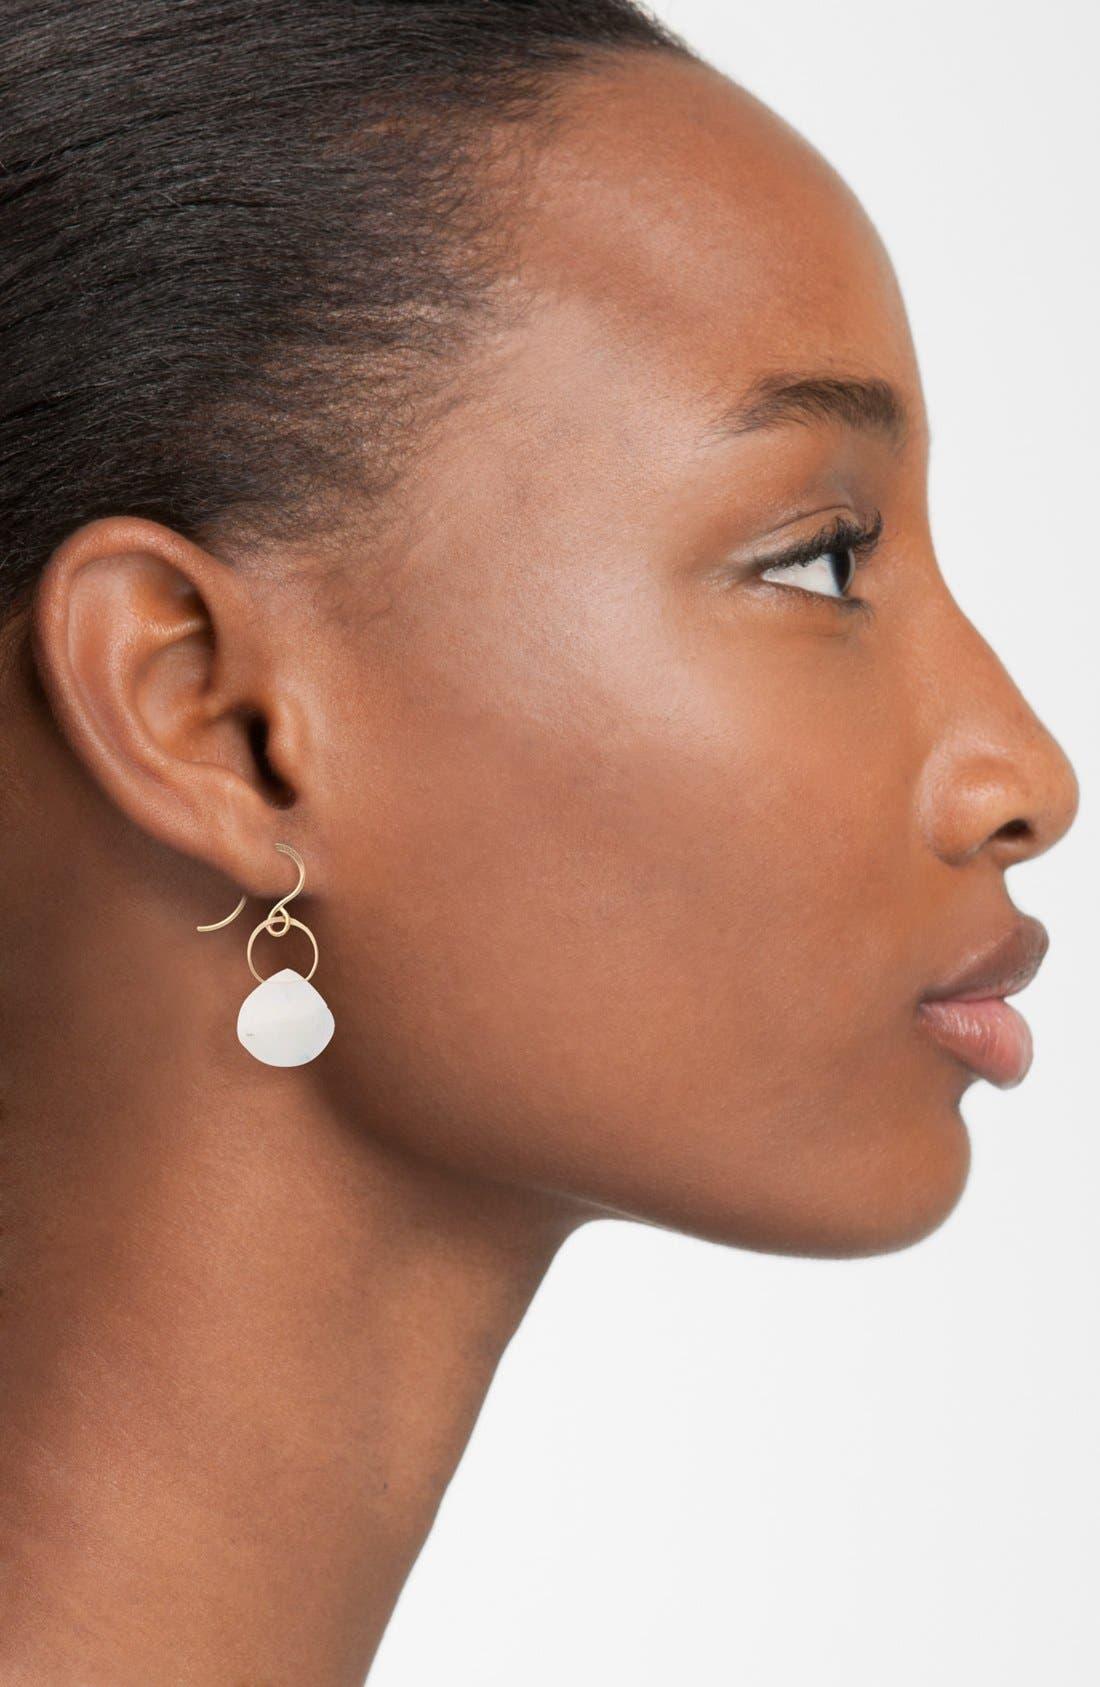 Semiprecious Stone Drop Earrings,                             Alternate thumbnail 4, color,                             LABRADORITE/ YELLOW GOLD